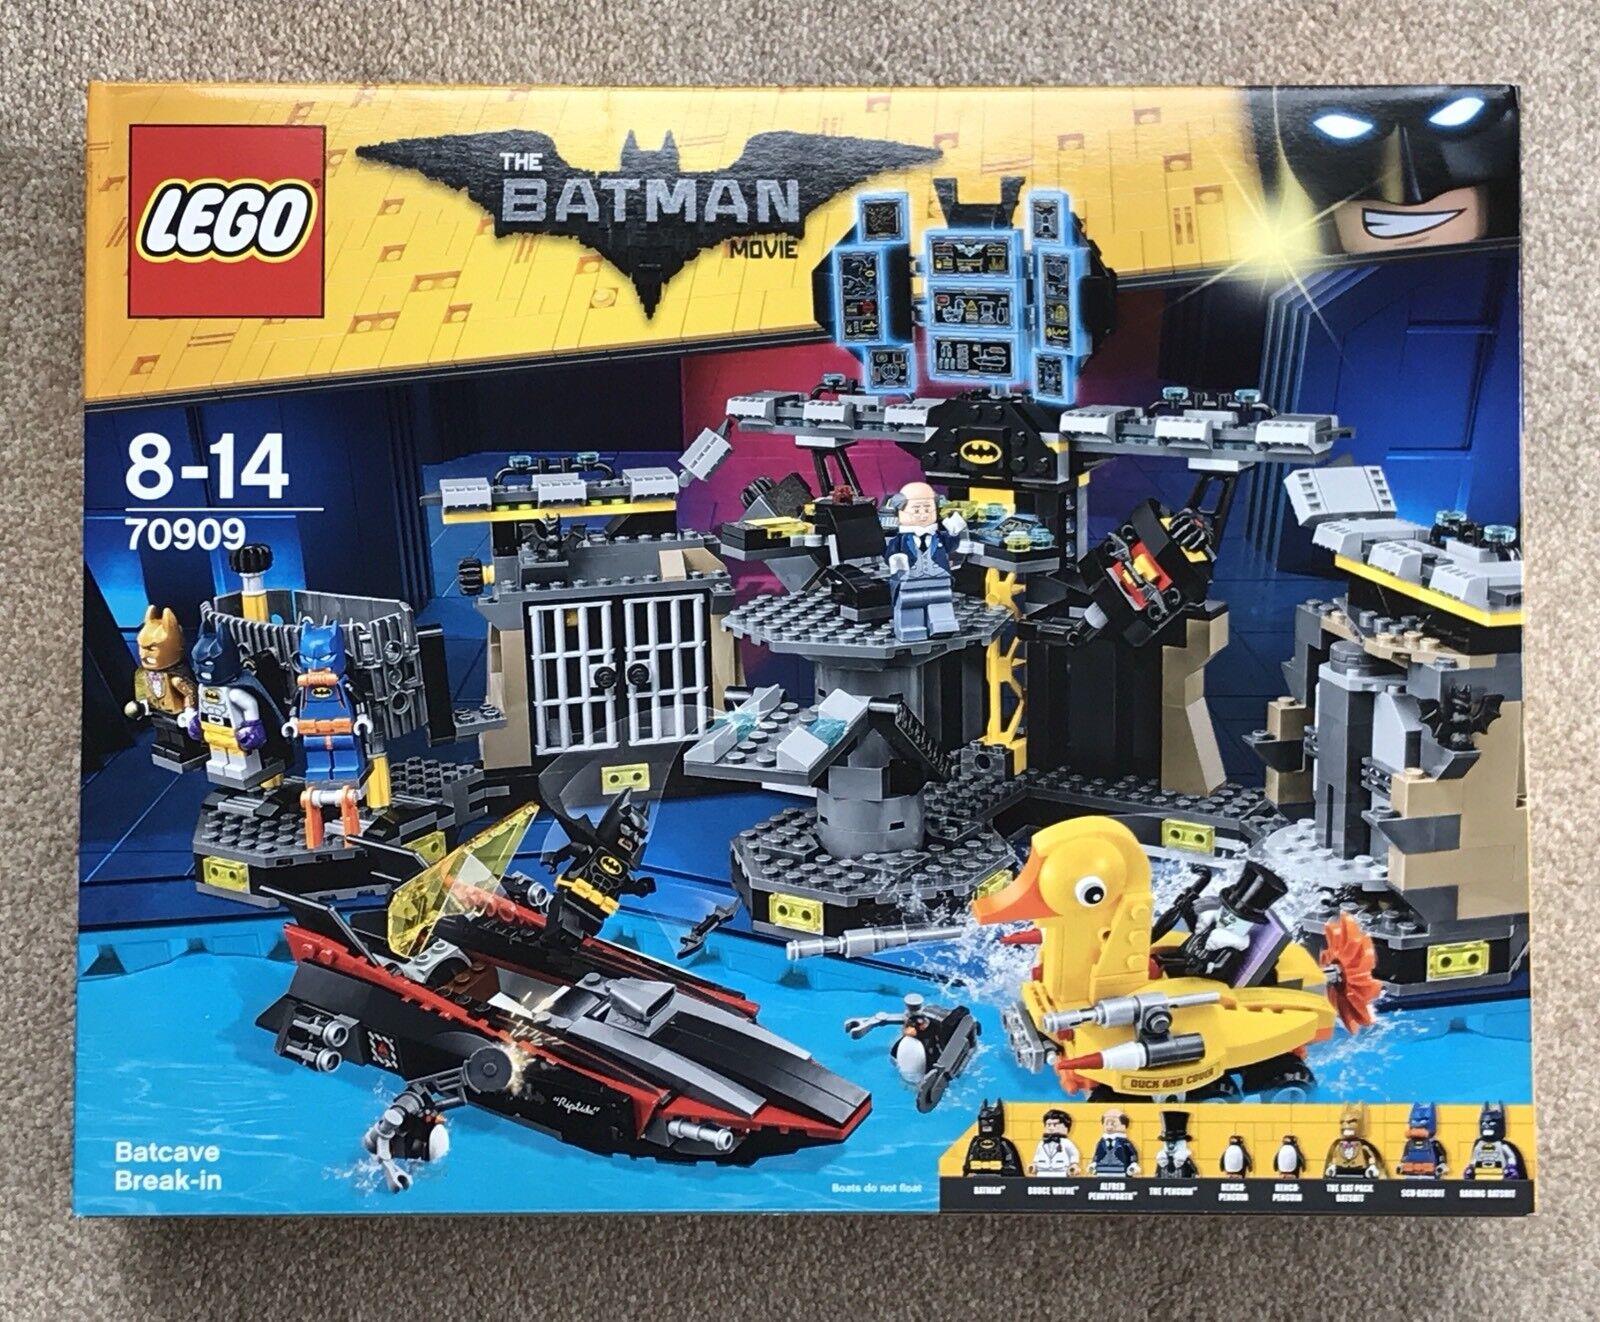 LEGO THE BATMAN MOVIE - BATCAVE BREAK-IN (70909) - New In Box - FREE P&P